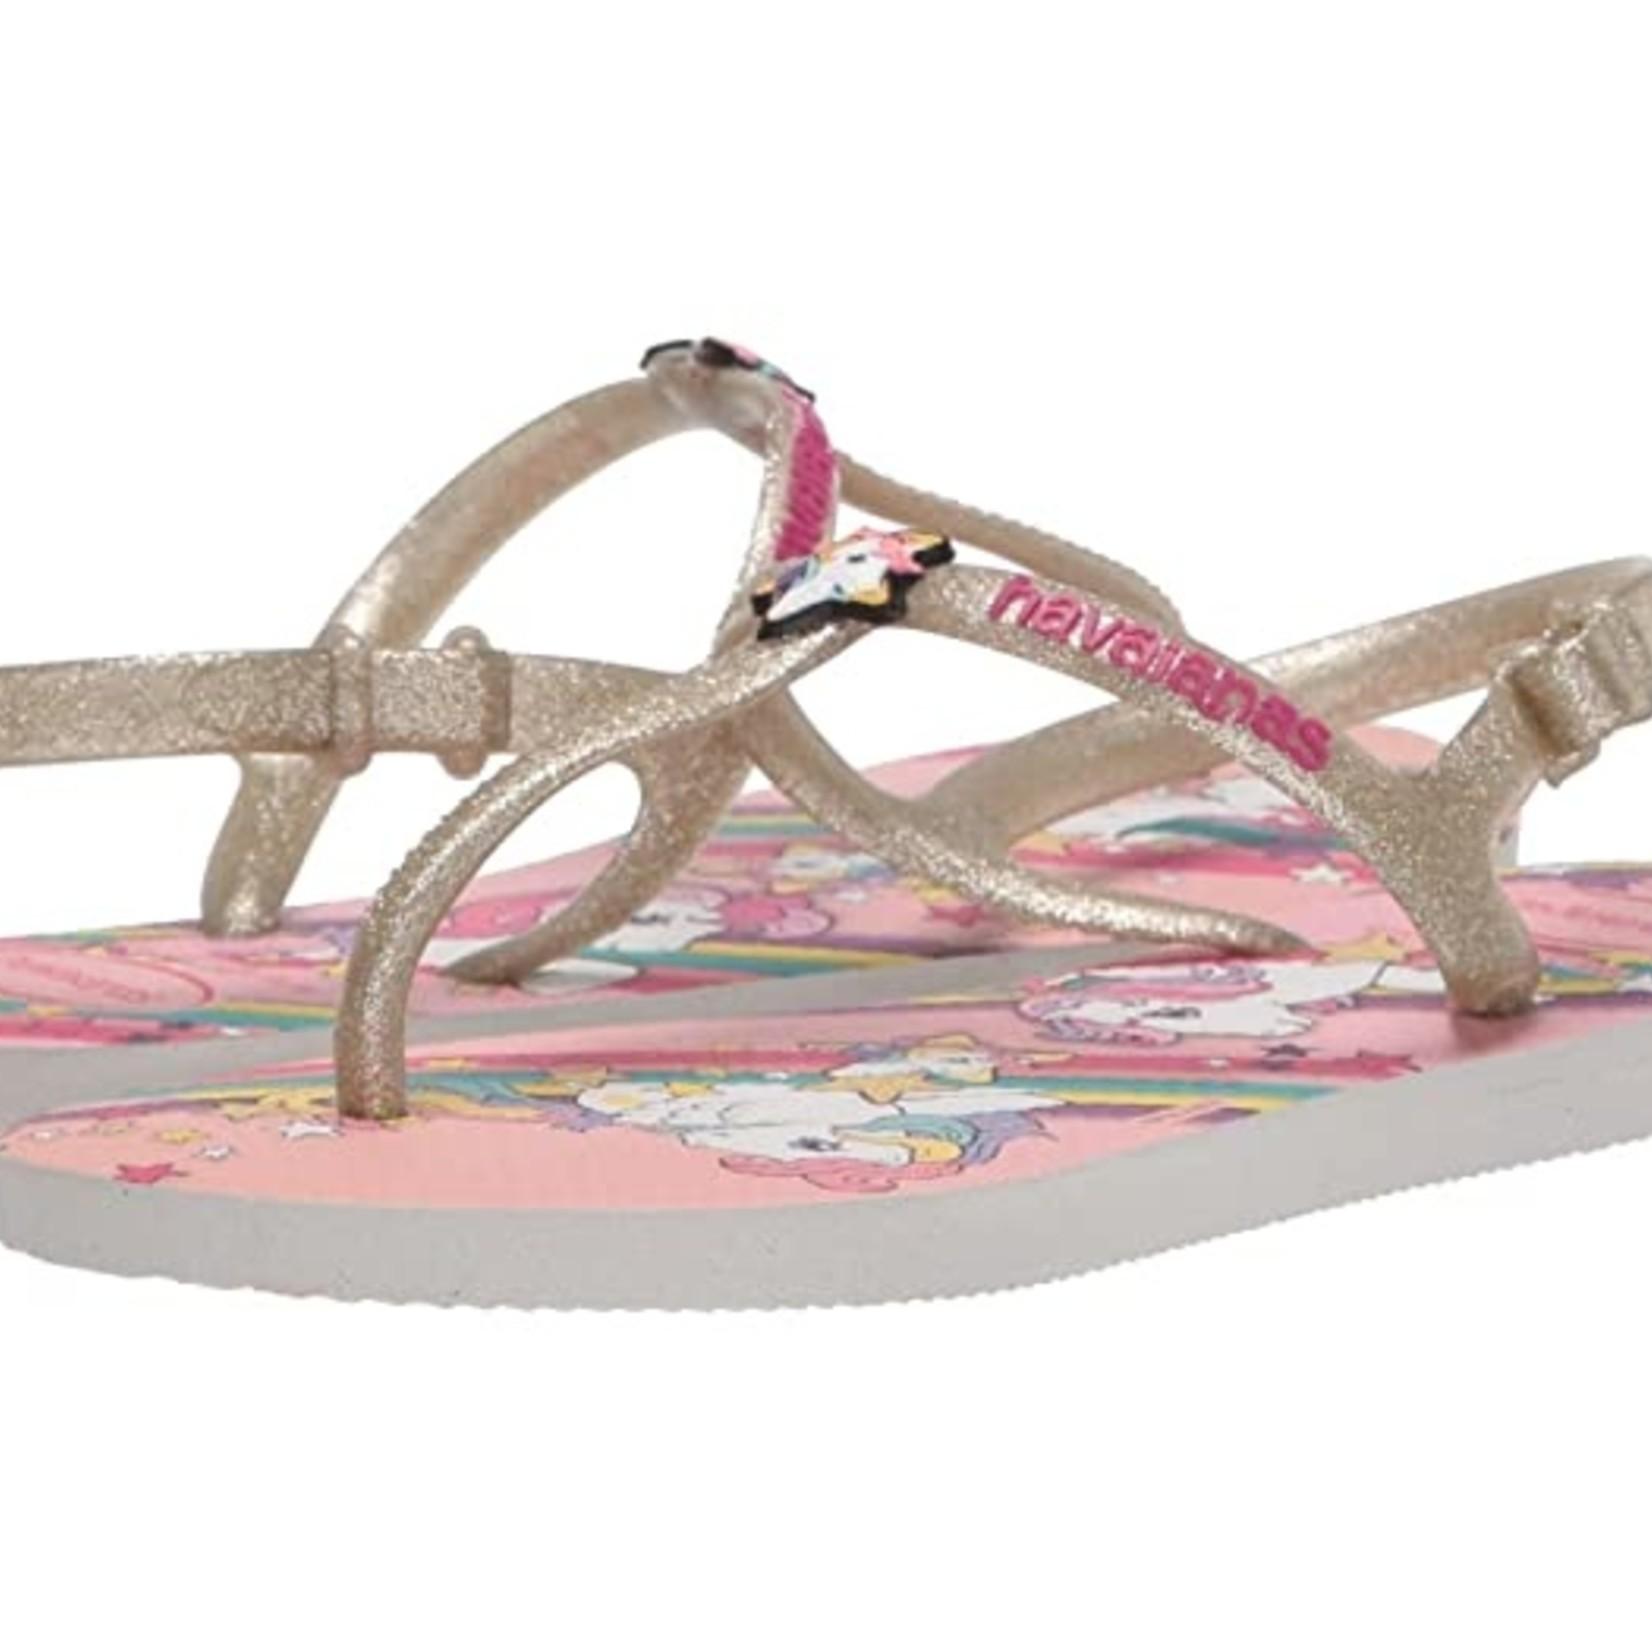 Havaianas Havaianas Girls Freedom Slim My Little Pony Sandals